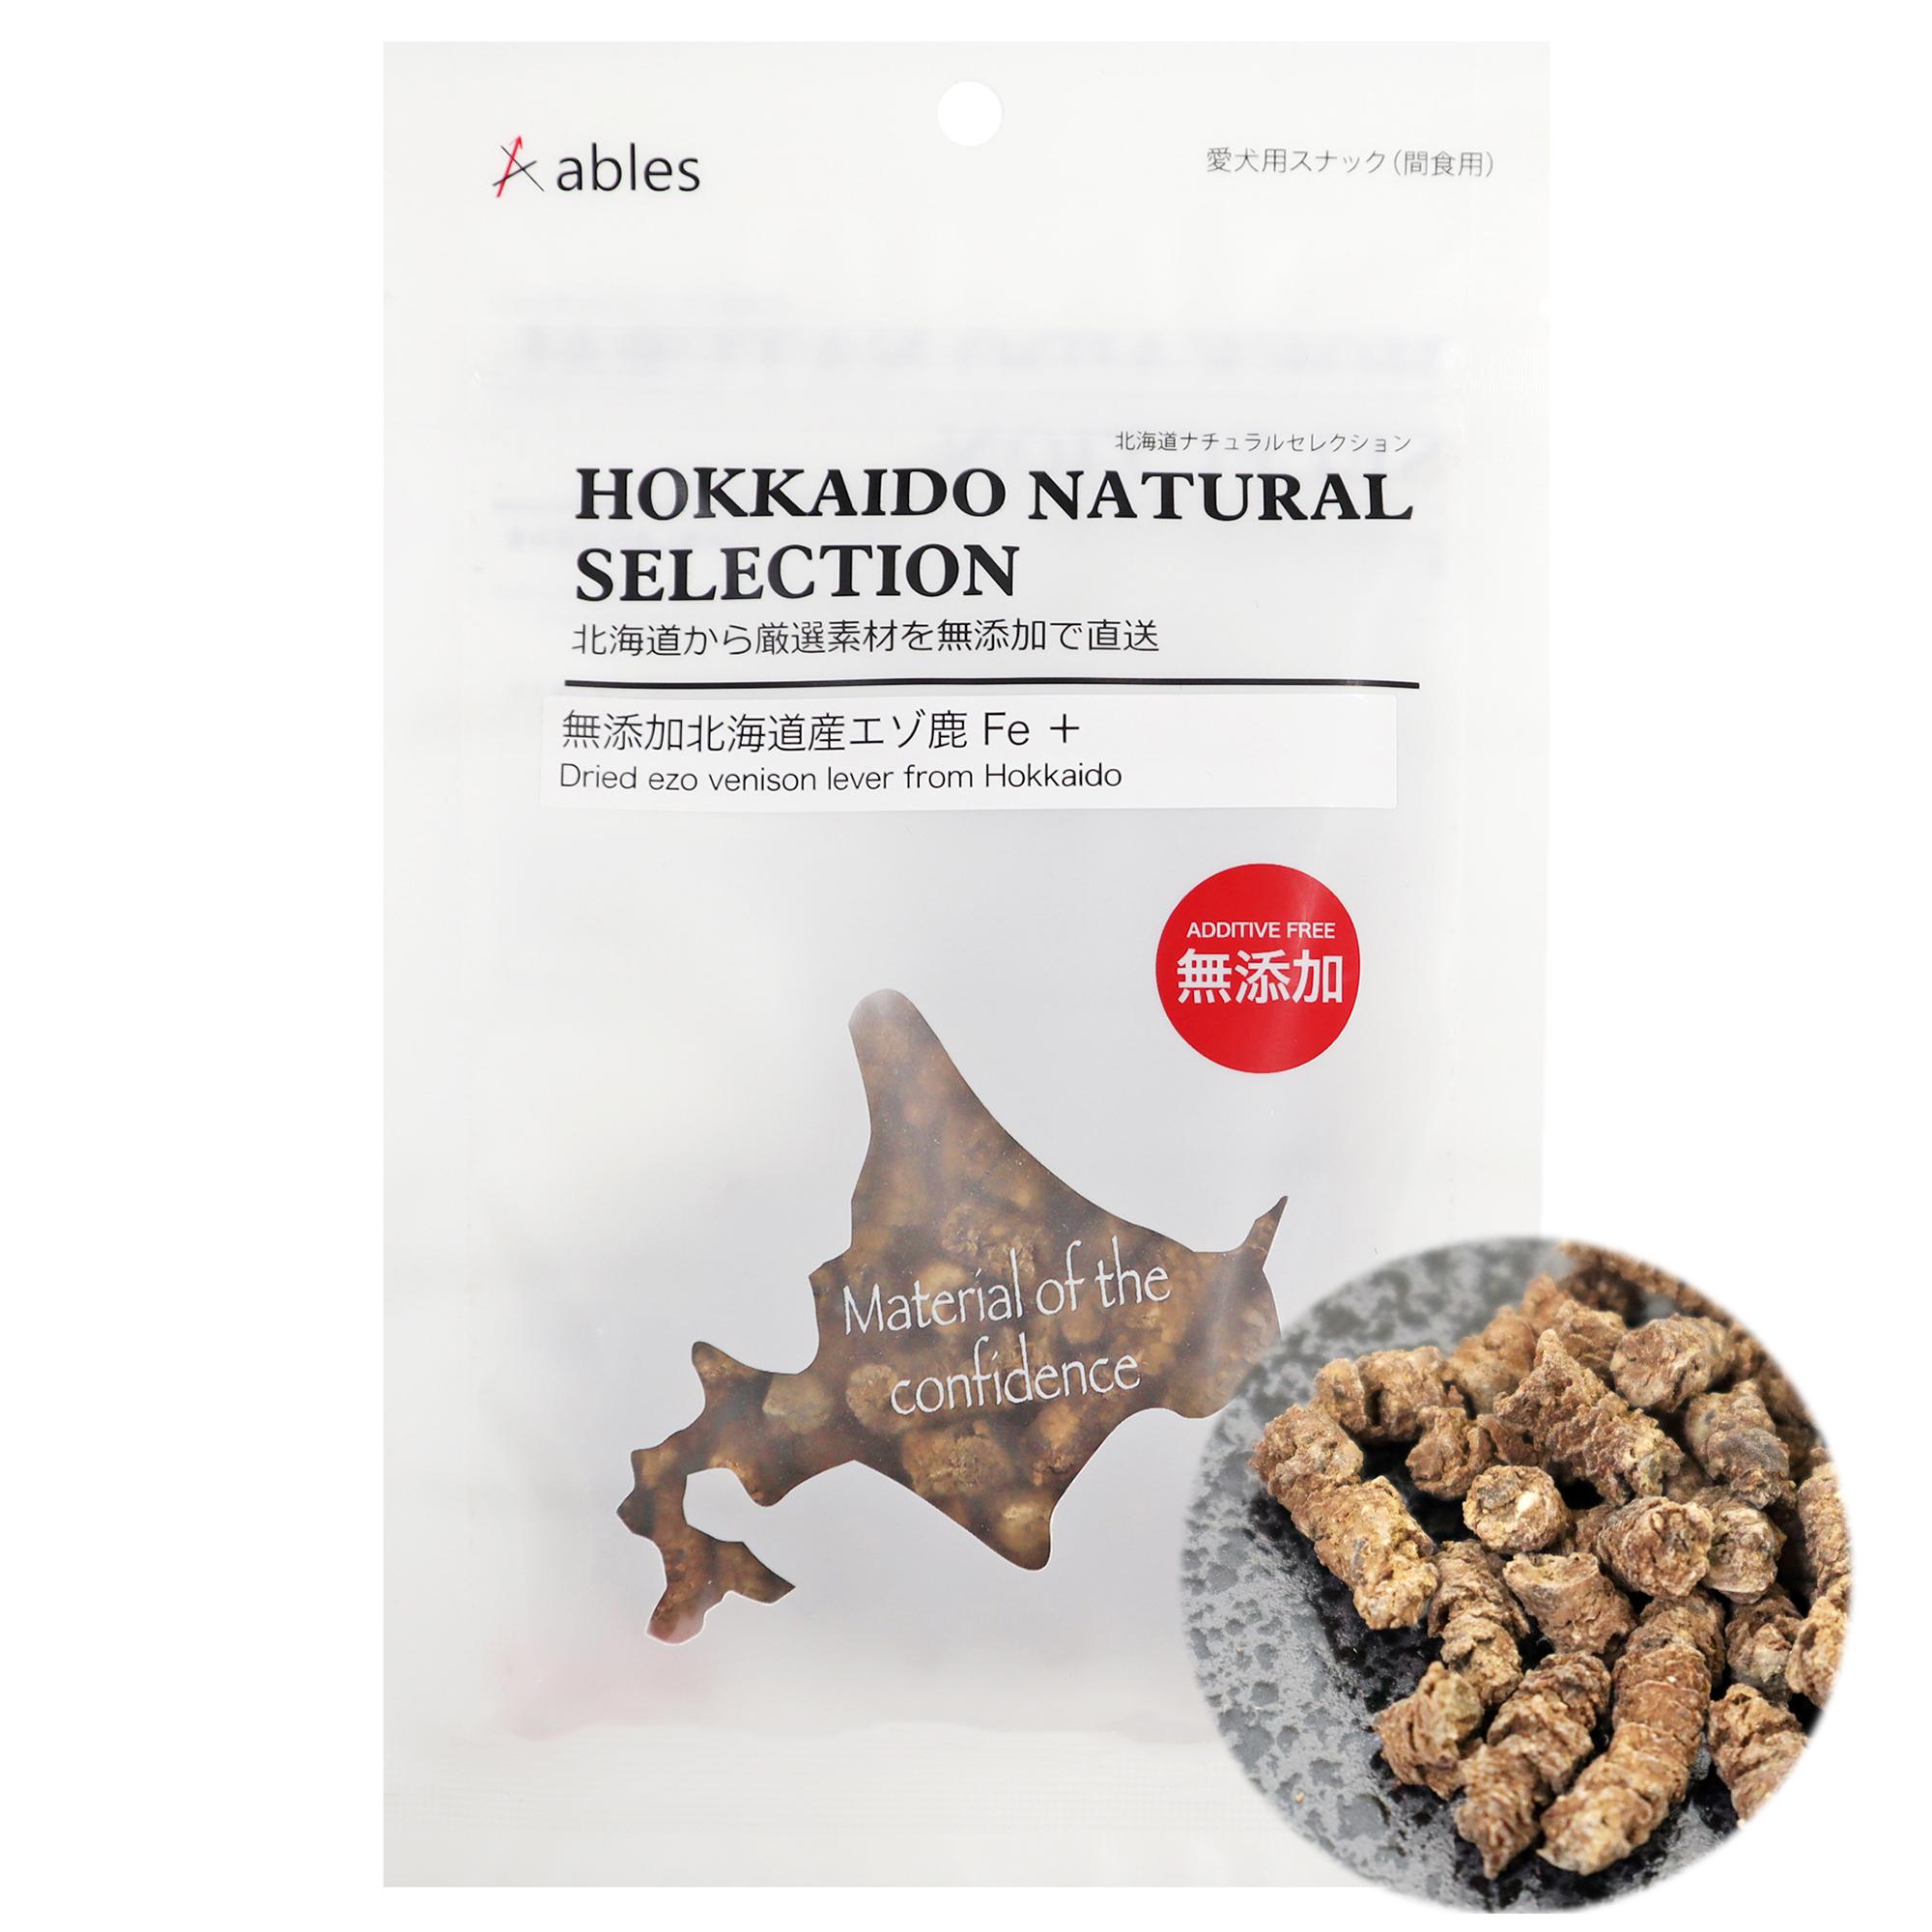 HOKKAIDO NATURAL SELECTION 無添加北海道産エゾ鹿 Fe + 30g